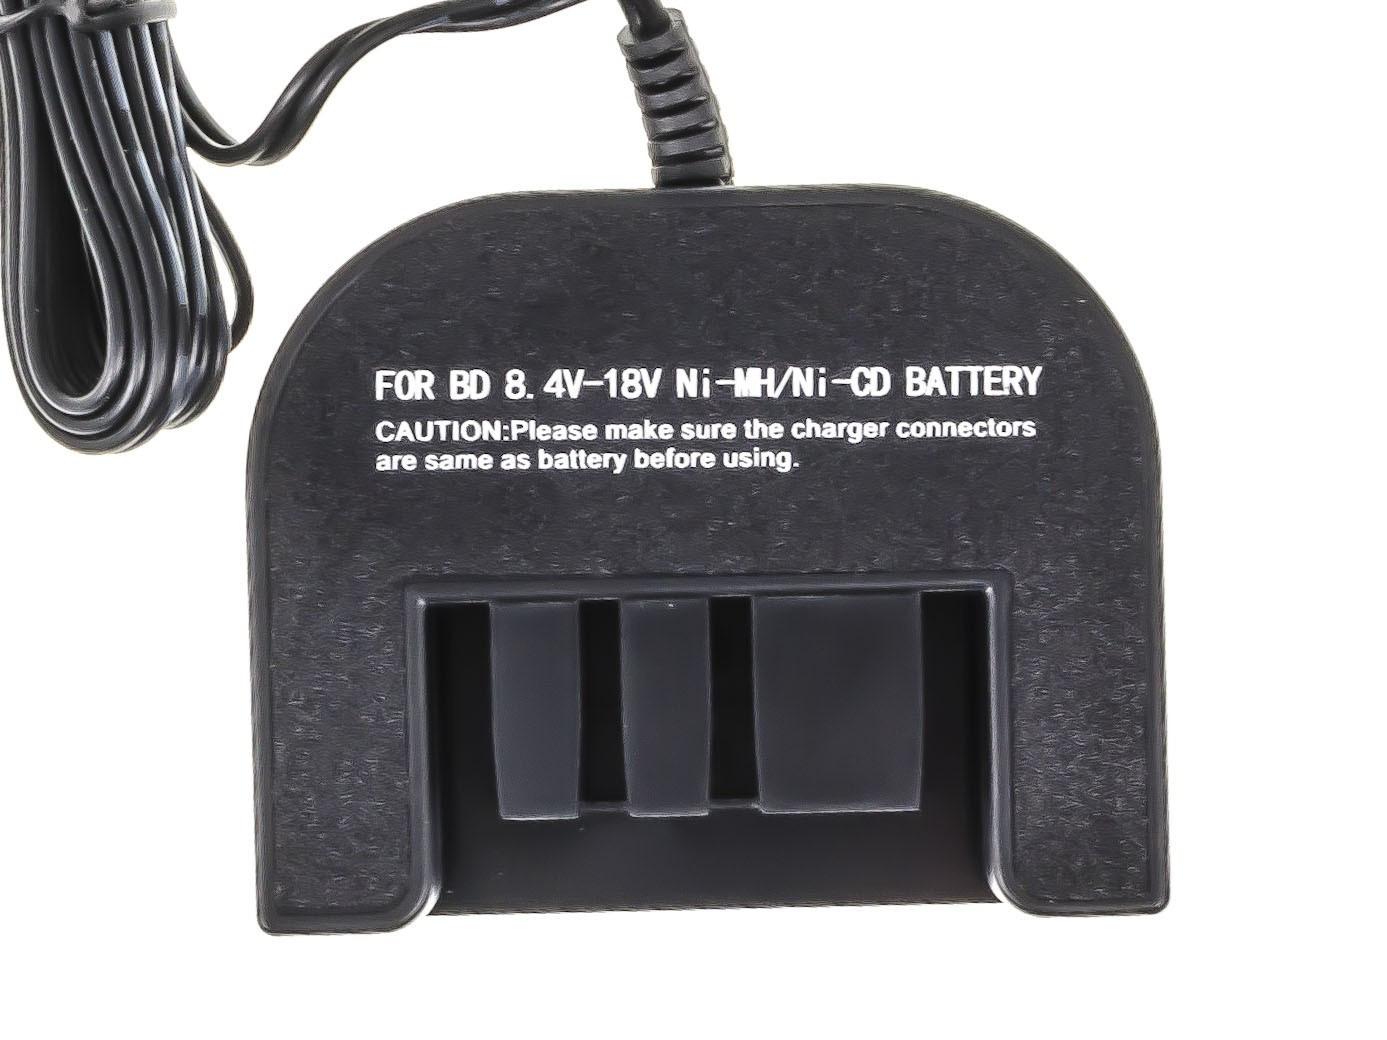 Green Cell ® Power Tool Battery Charger for Black&Decker 8.4V -18V Ni-MH Ni-Cd